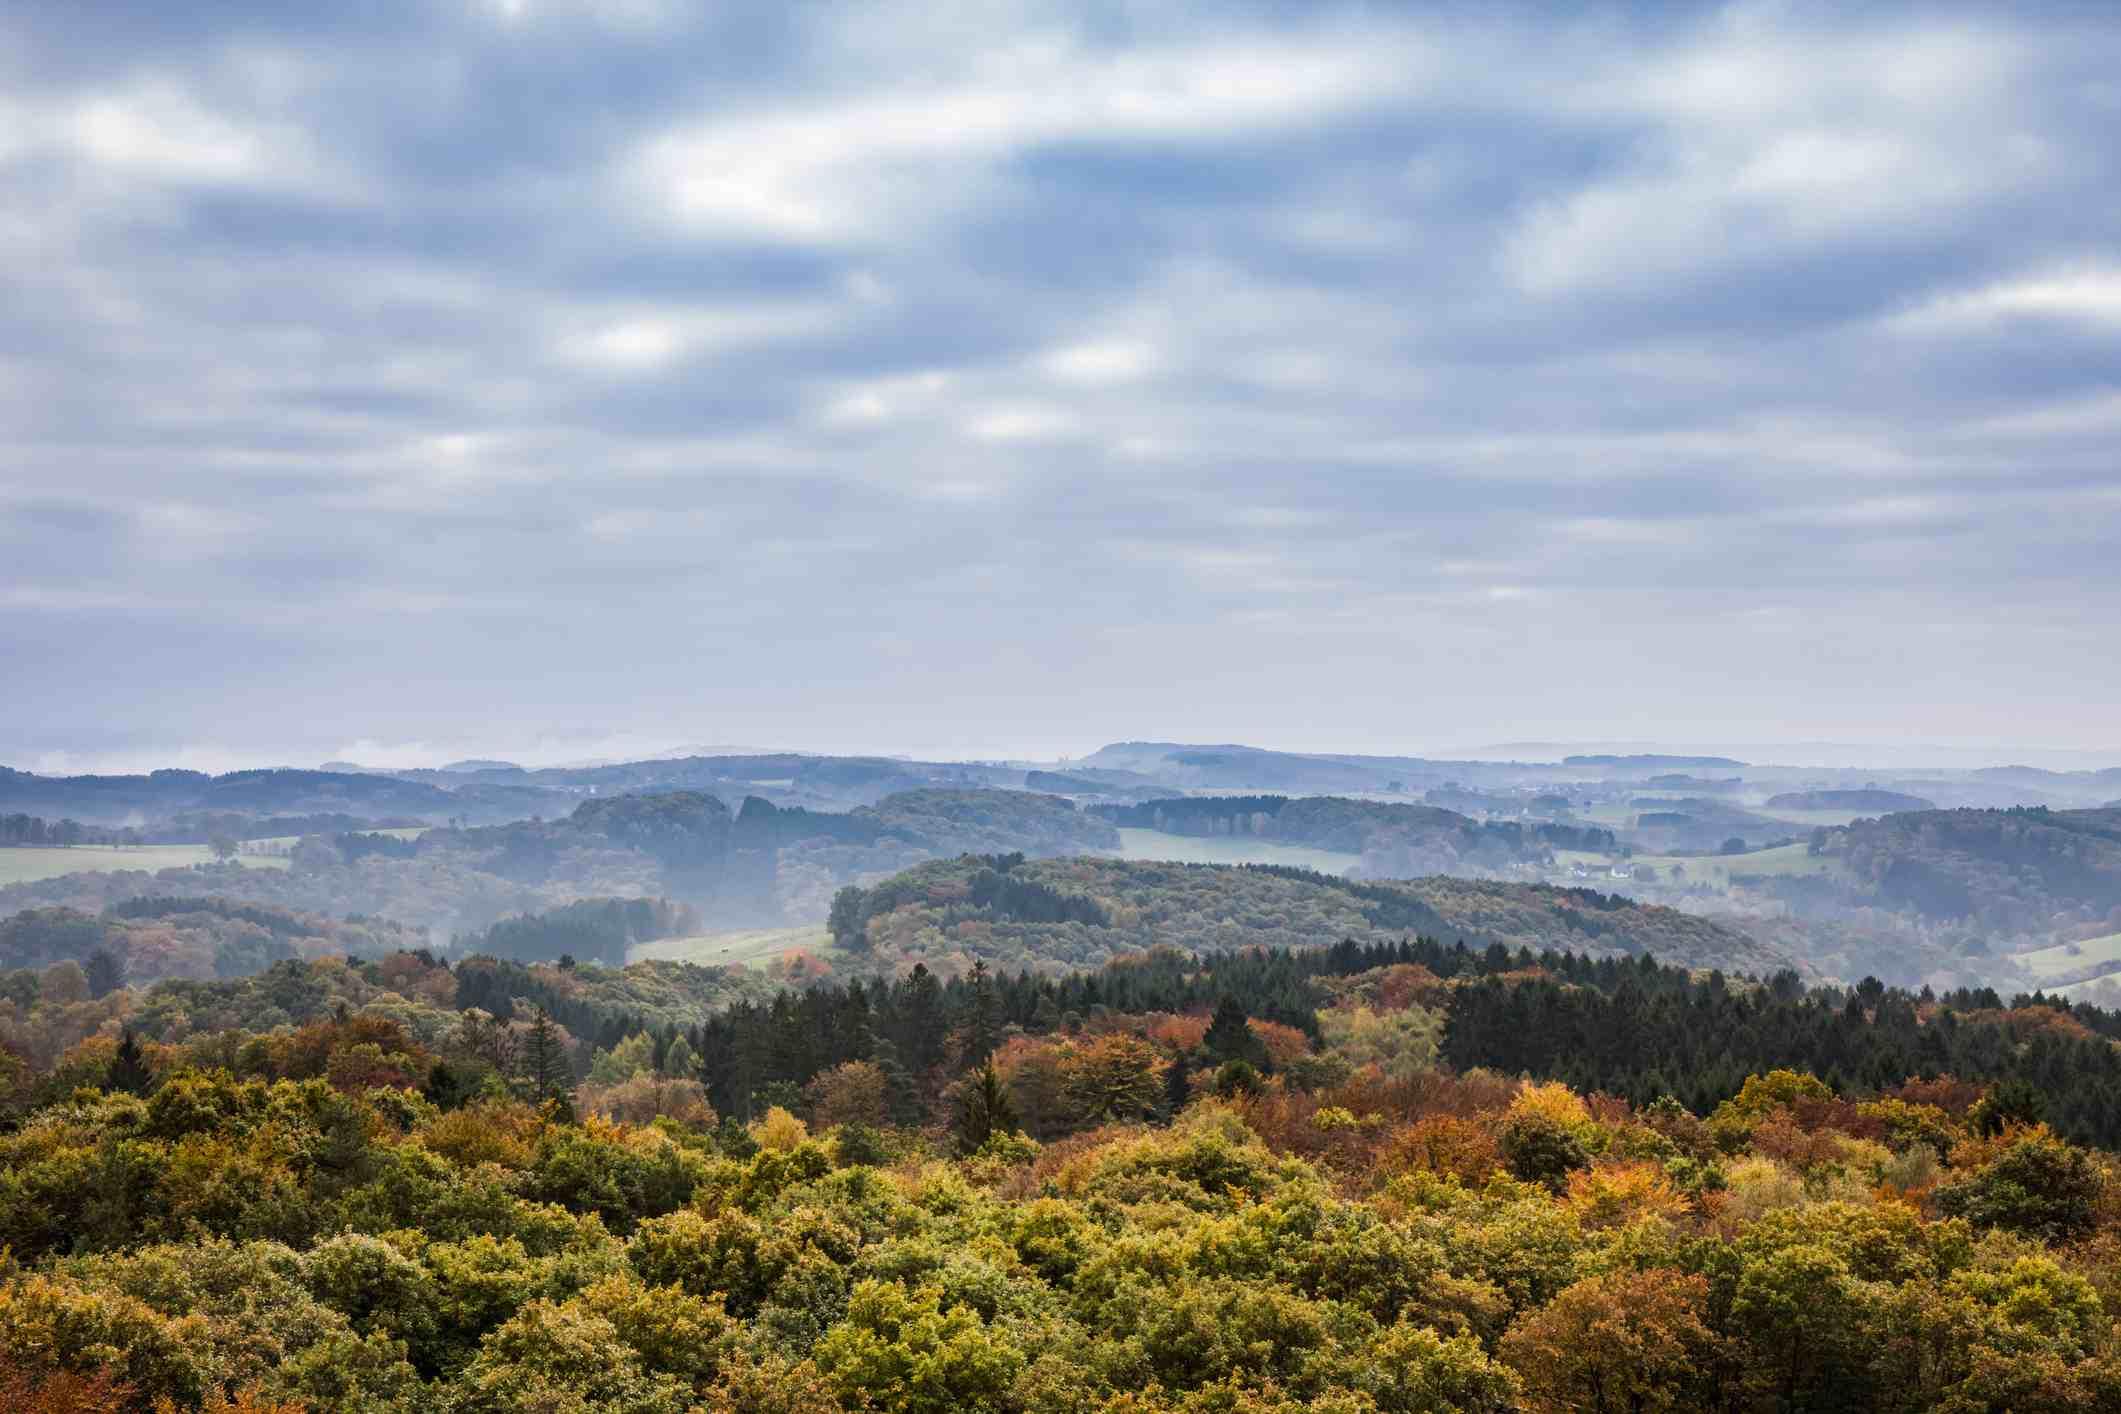 Bergisches Land in autumn - North Rhine-Westphalia, Germany